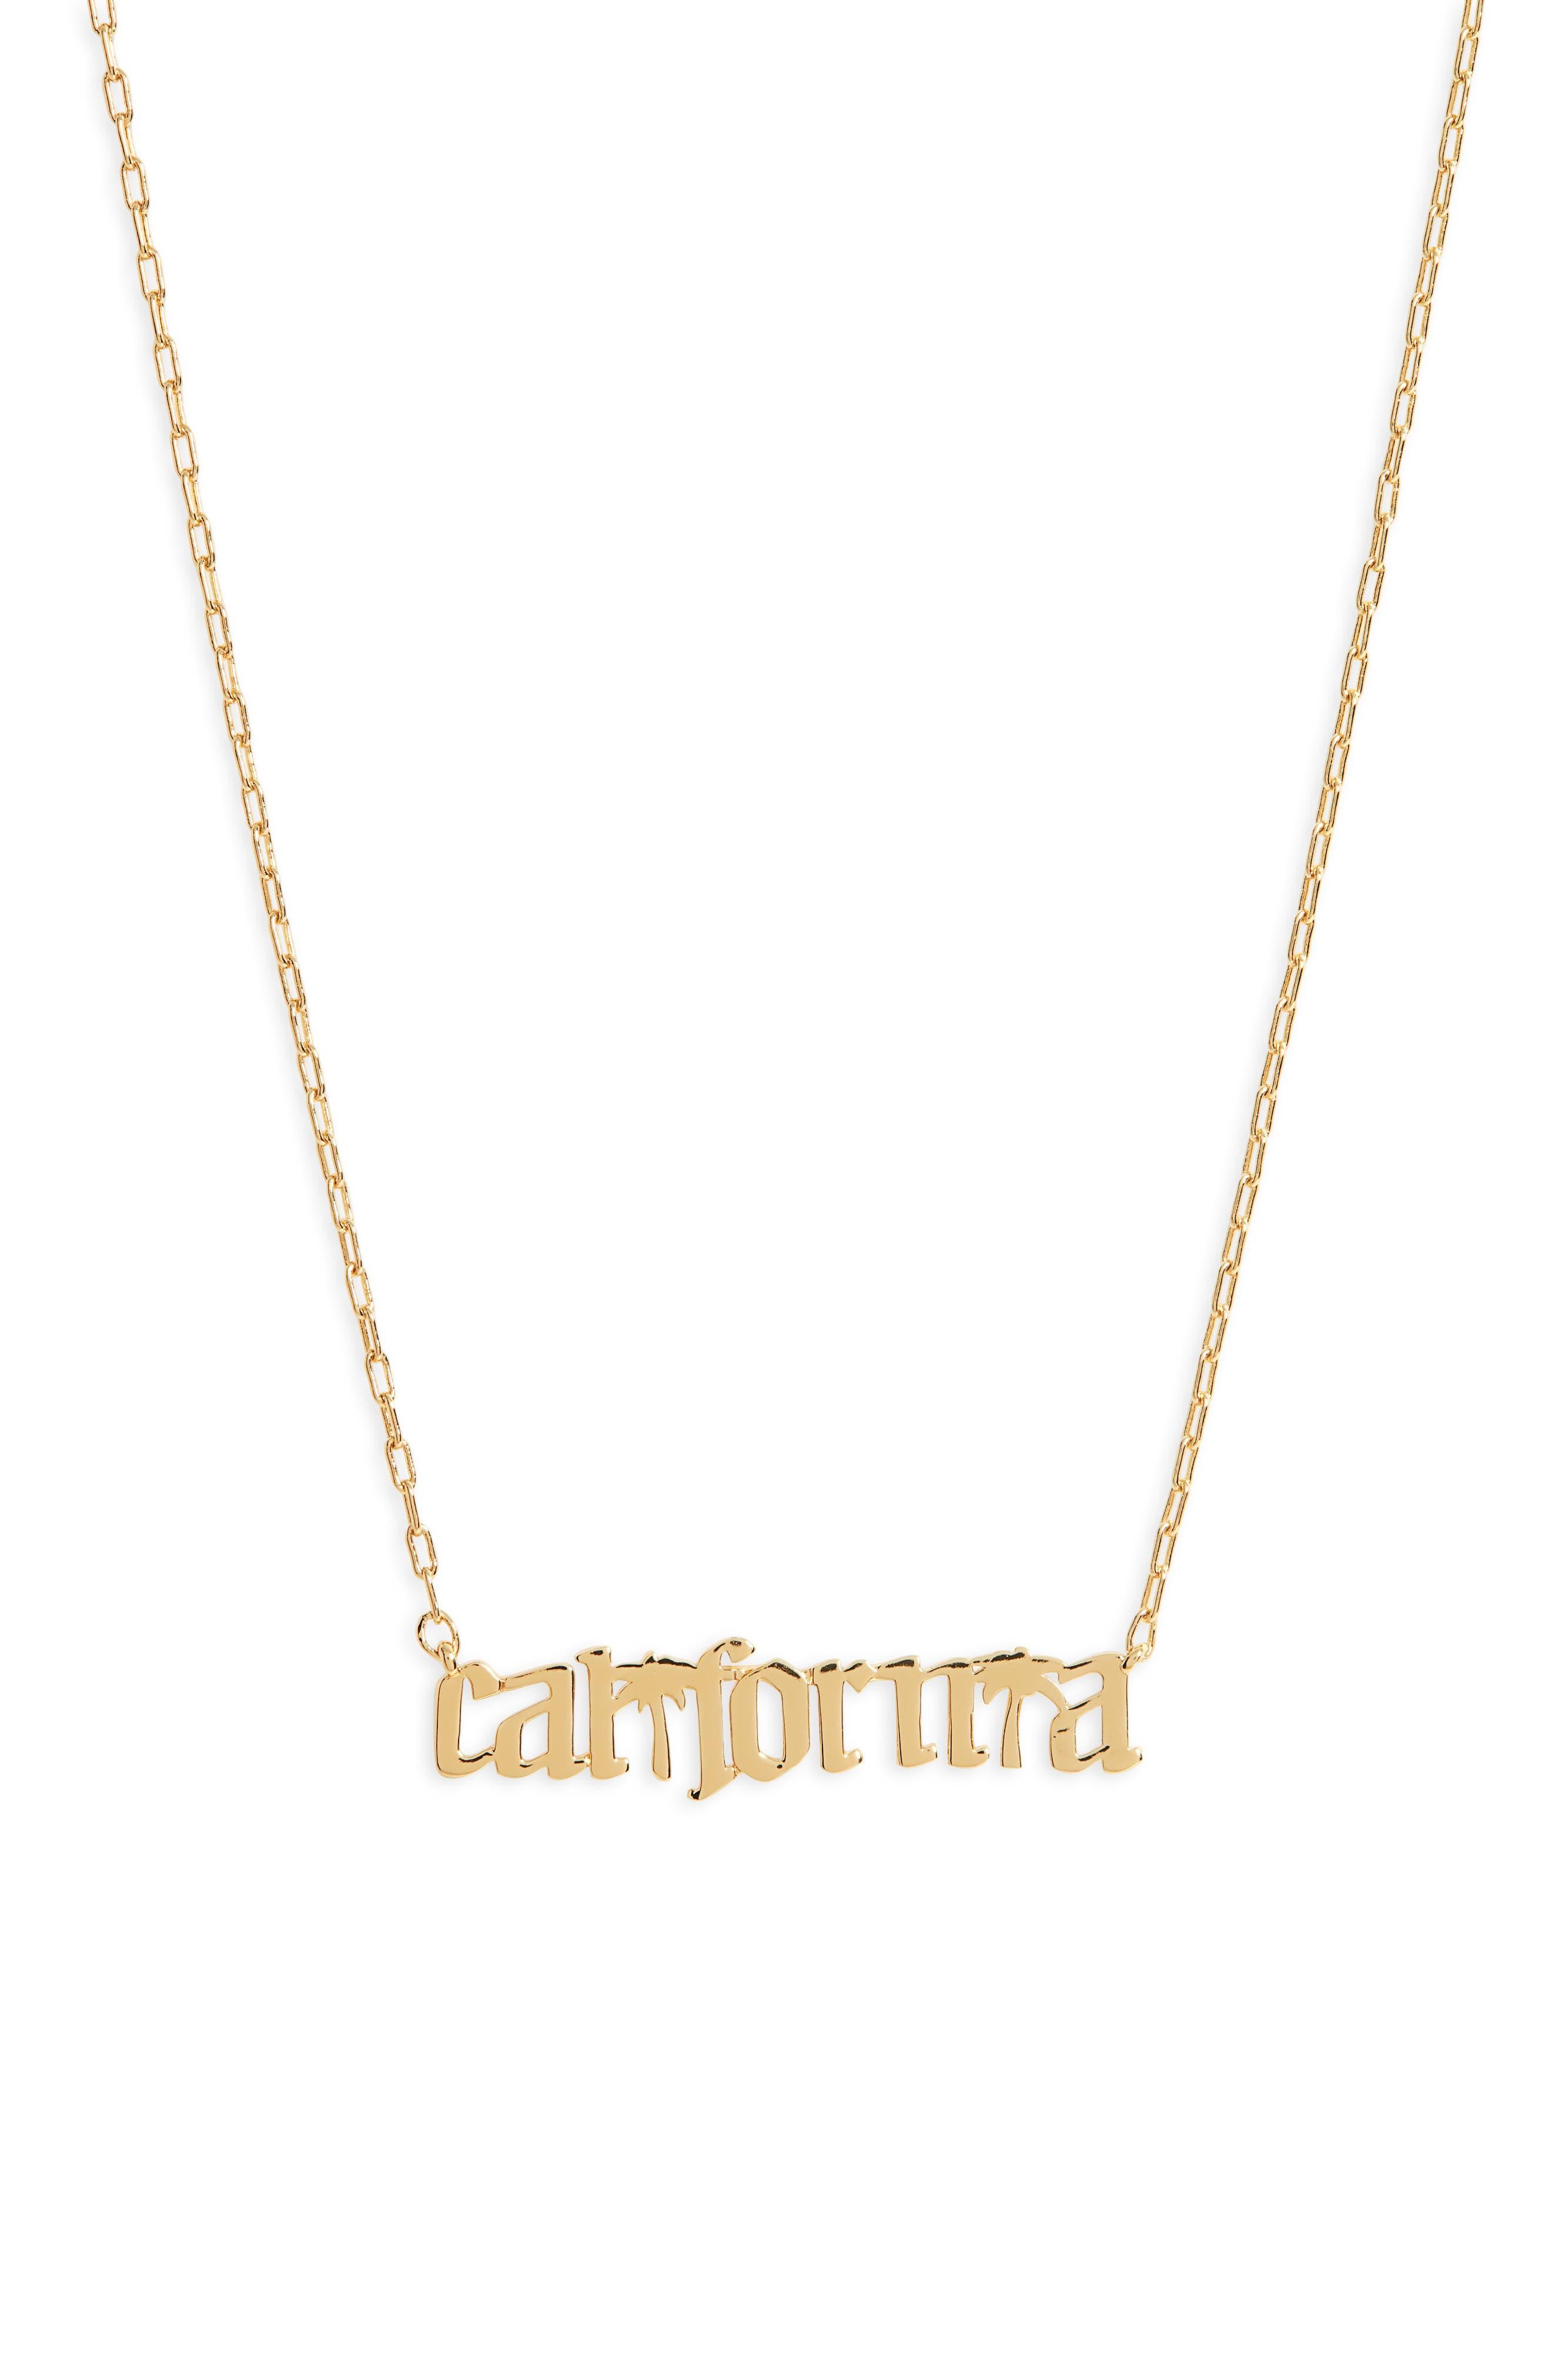 California Script Pendant Necklace